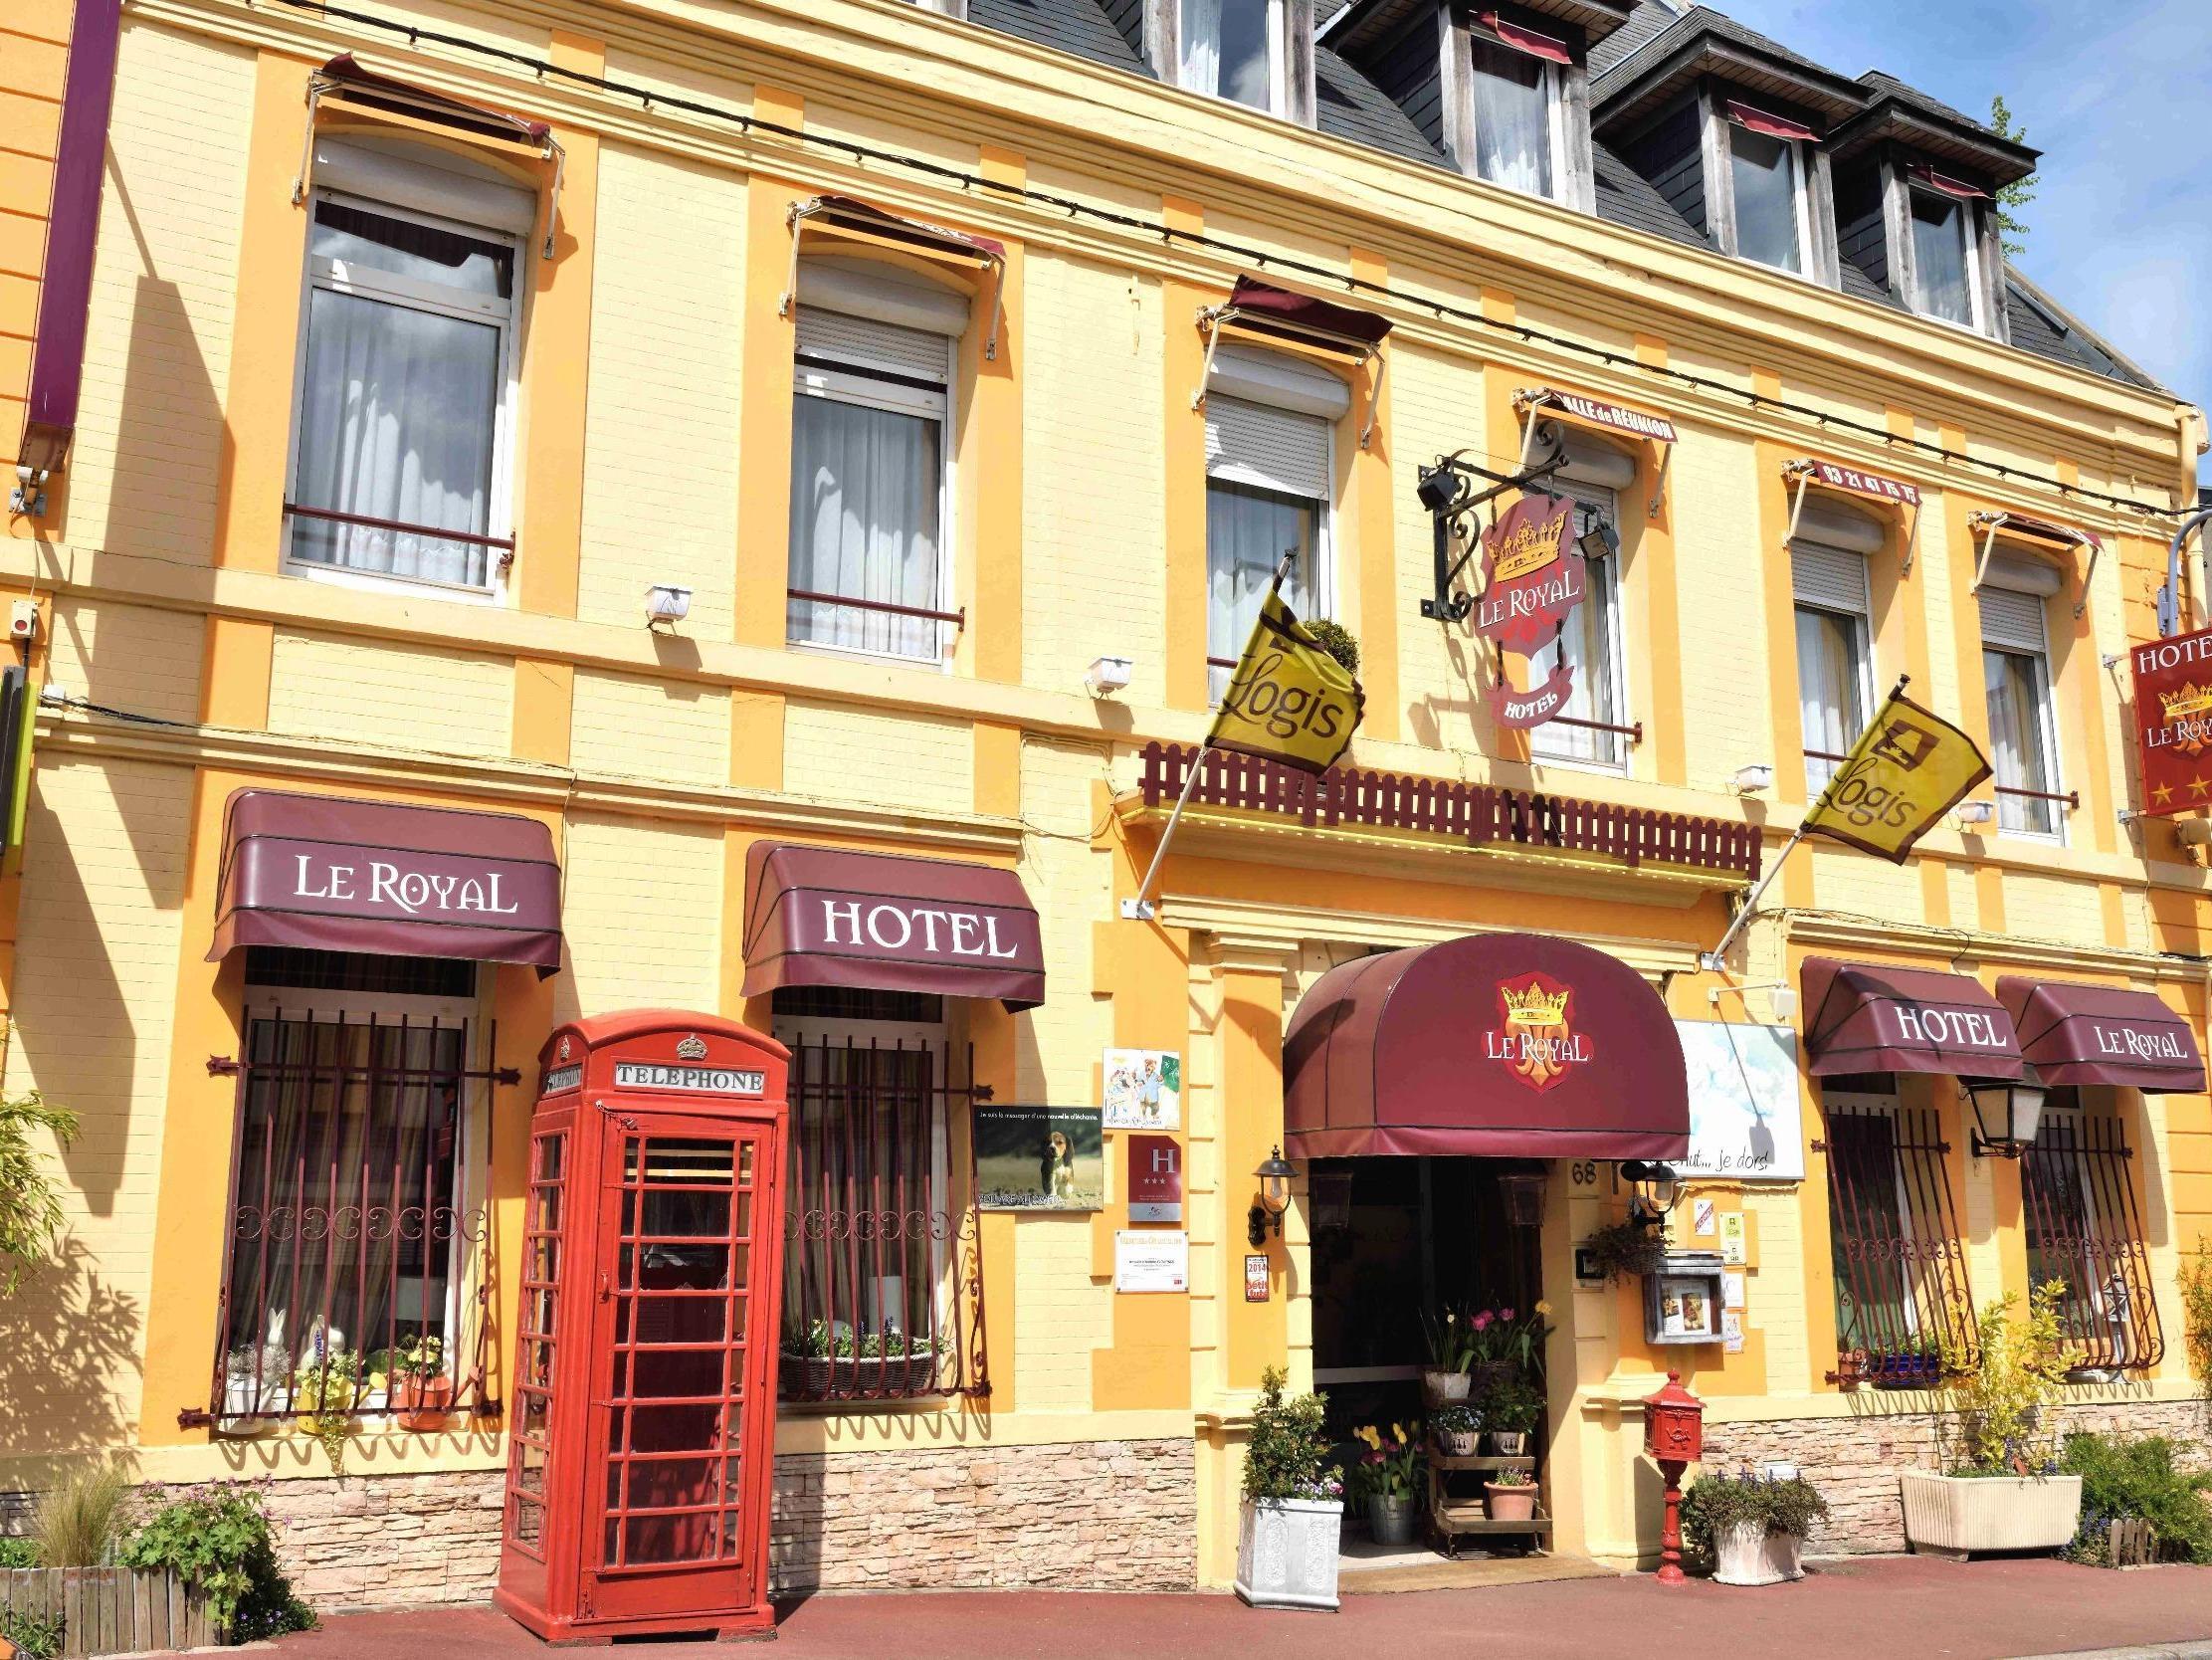 Le Royal Hotel Facade St Pol Sur Ternoise 380968